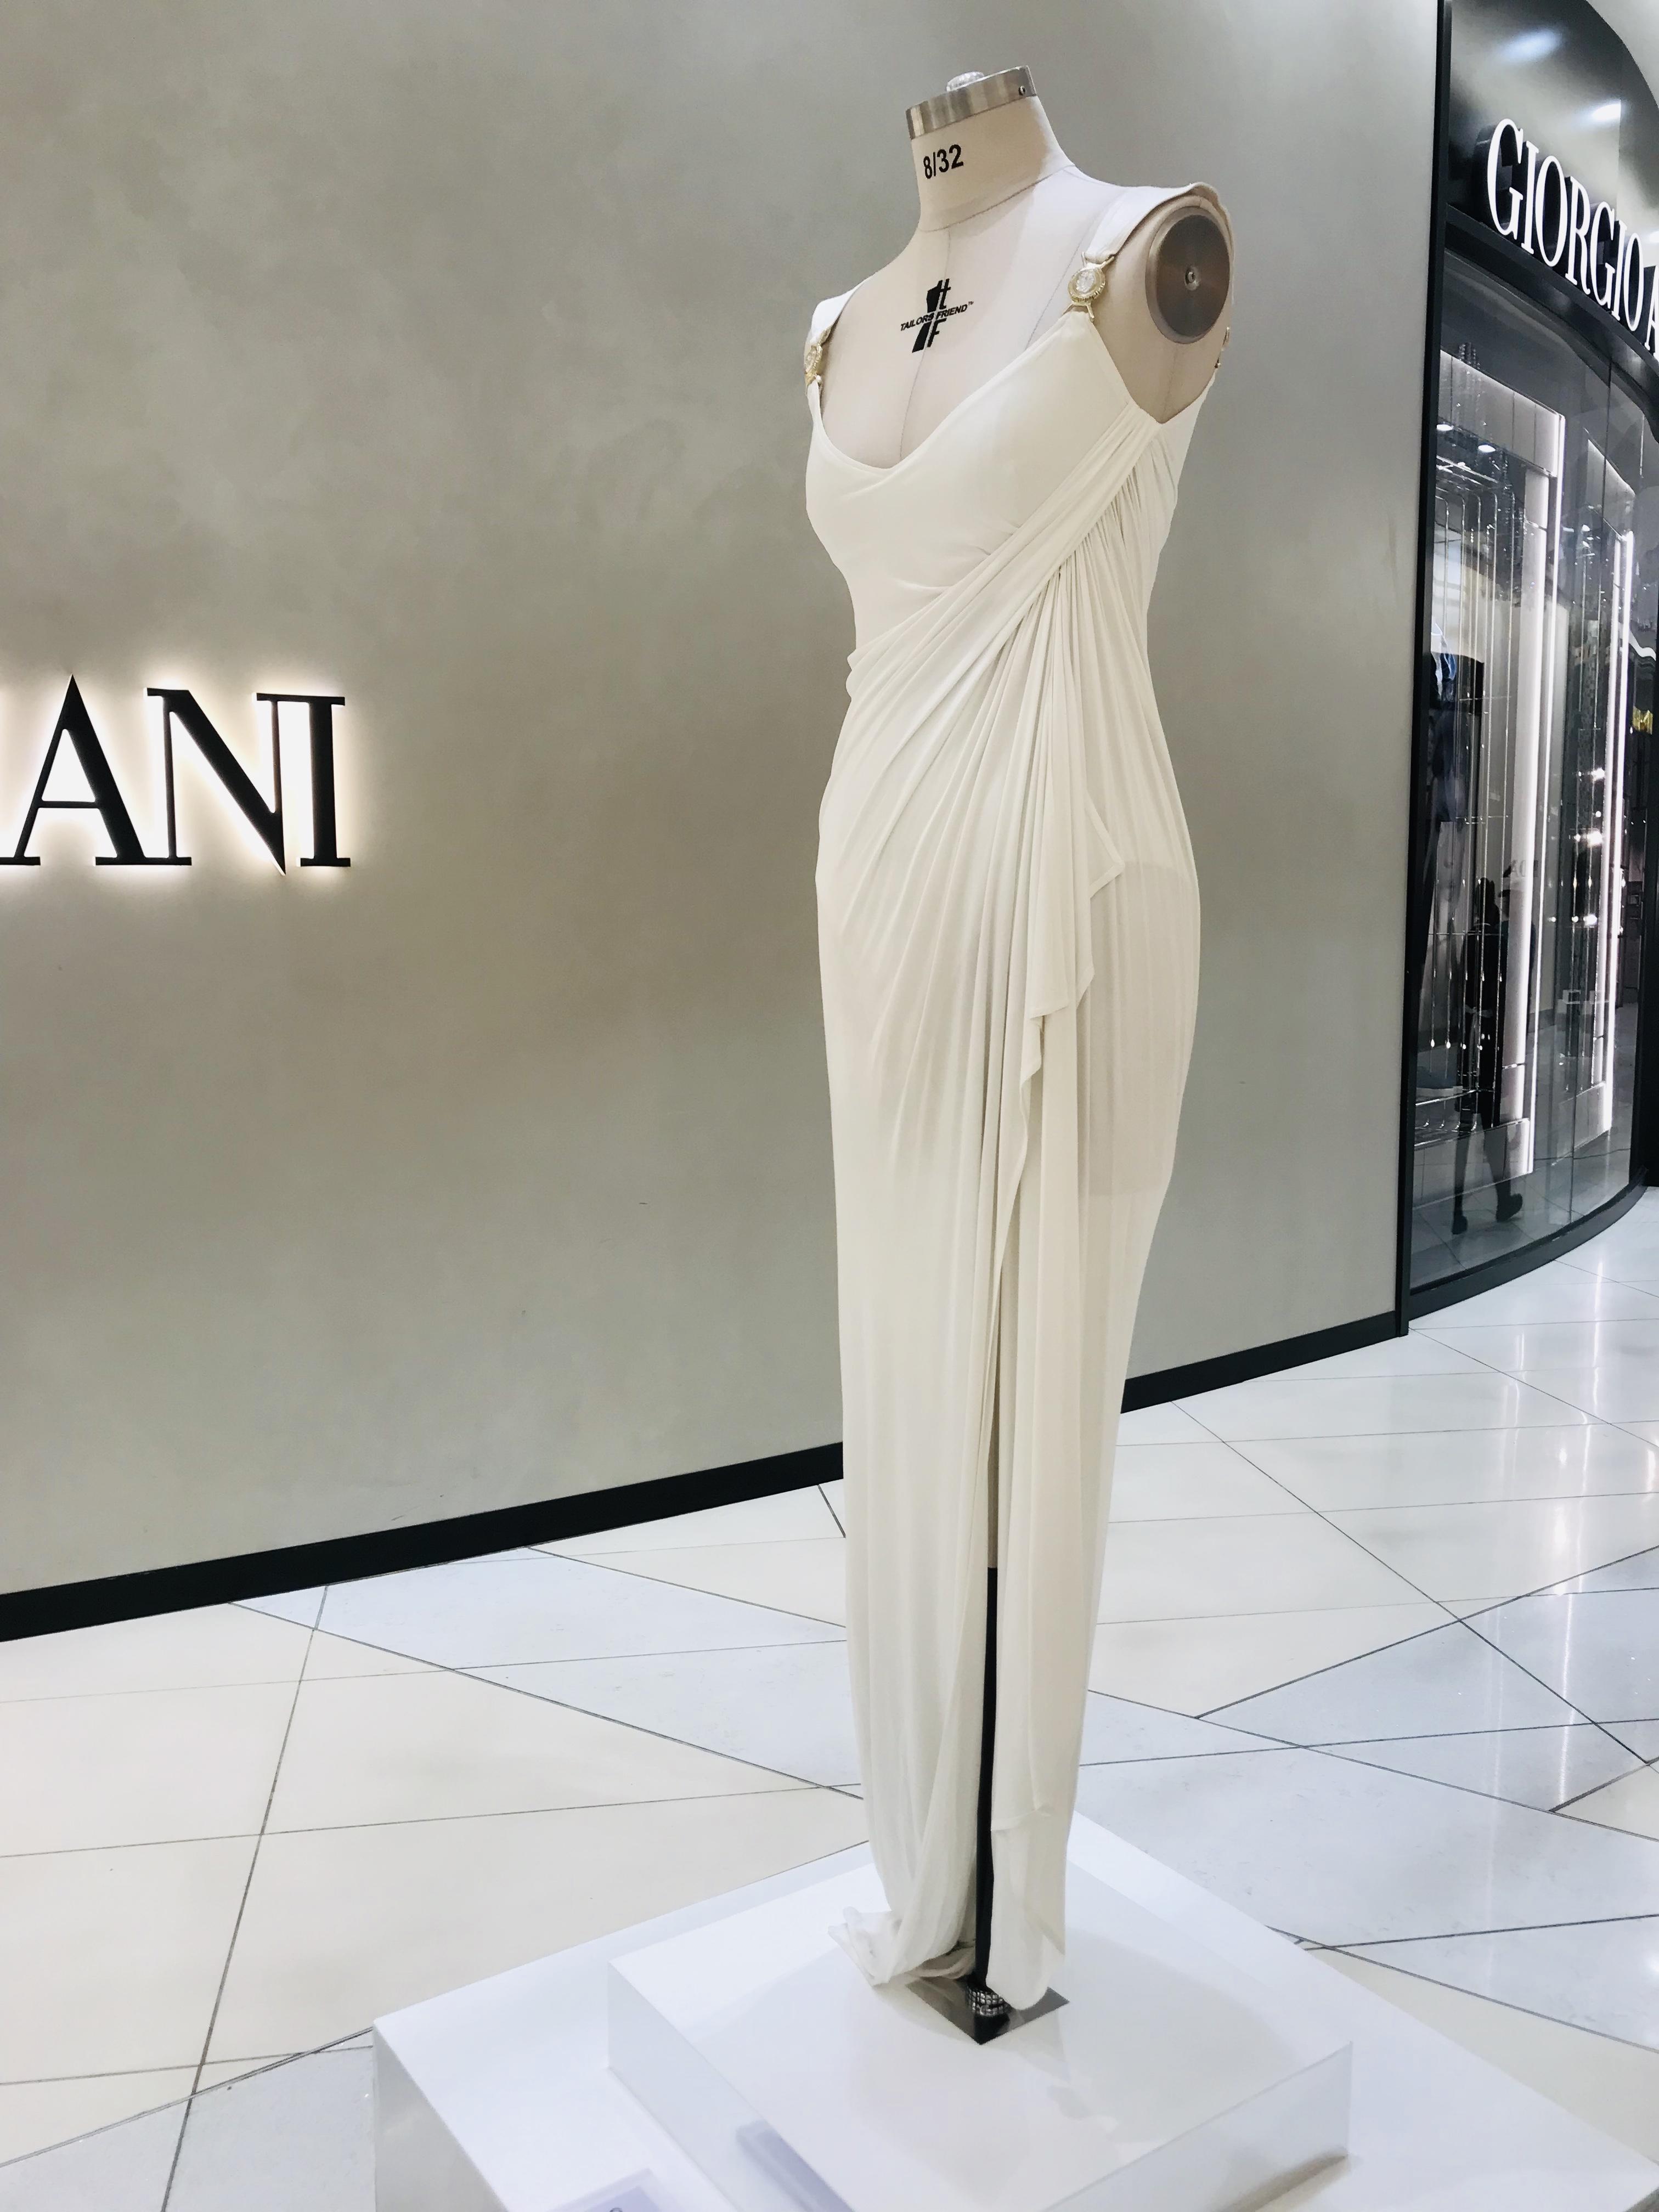 Gianni Versace 1980s